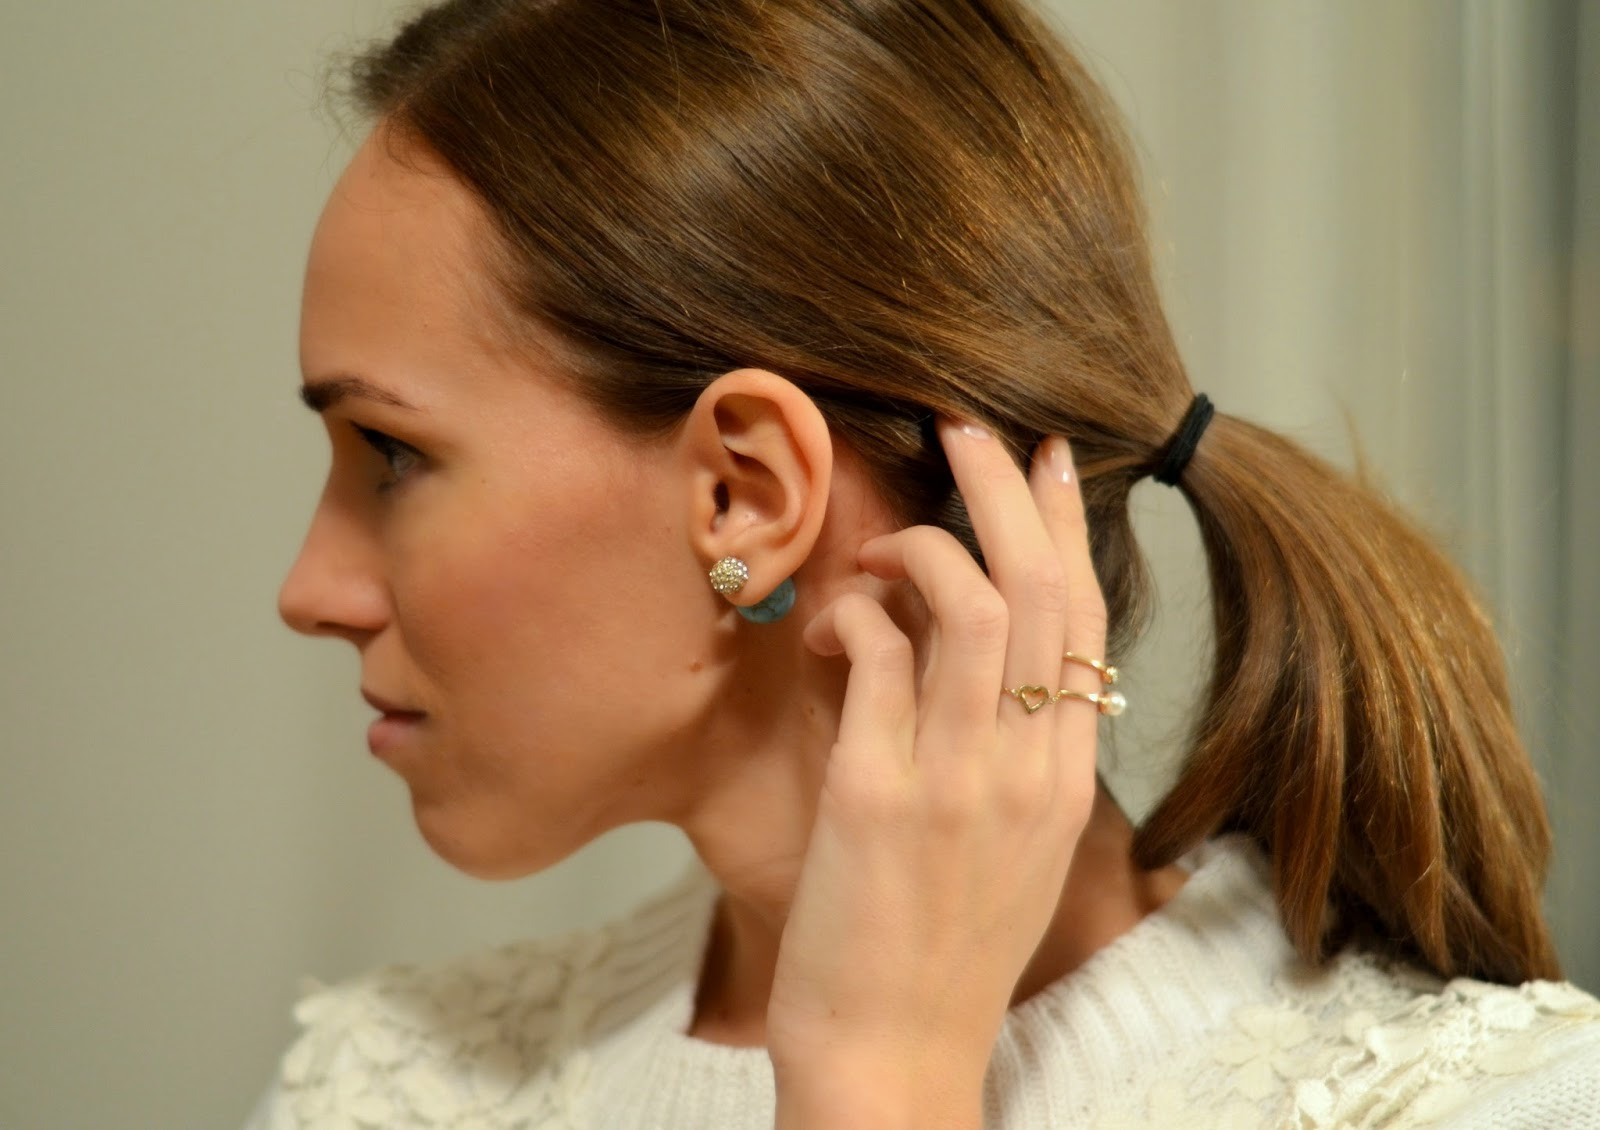 east-urban-turquoise-peekaboo-double-side-earrings